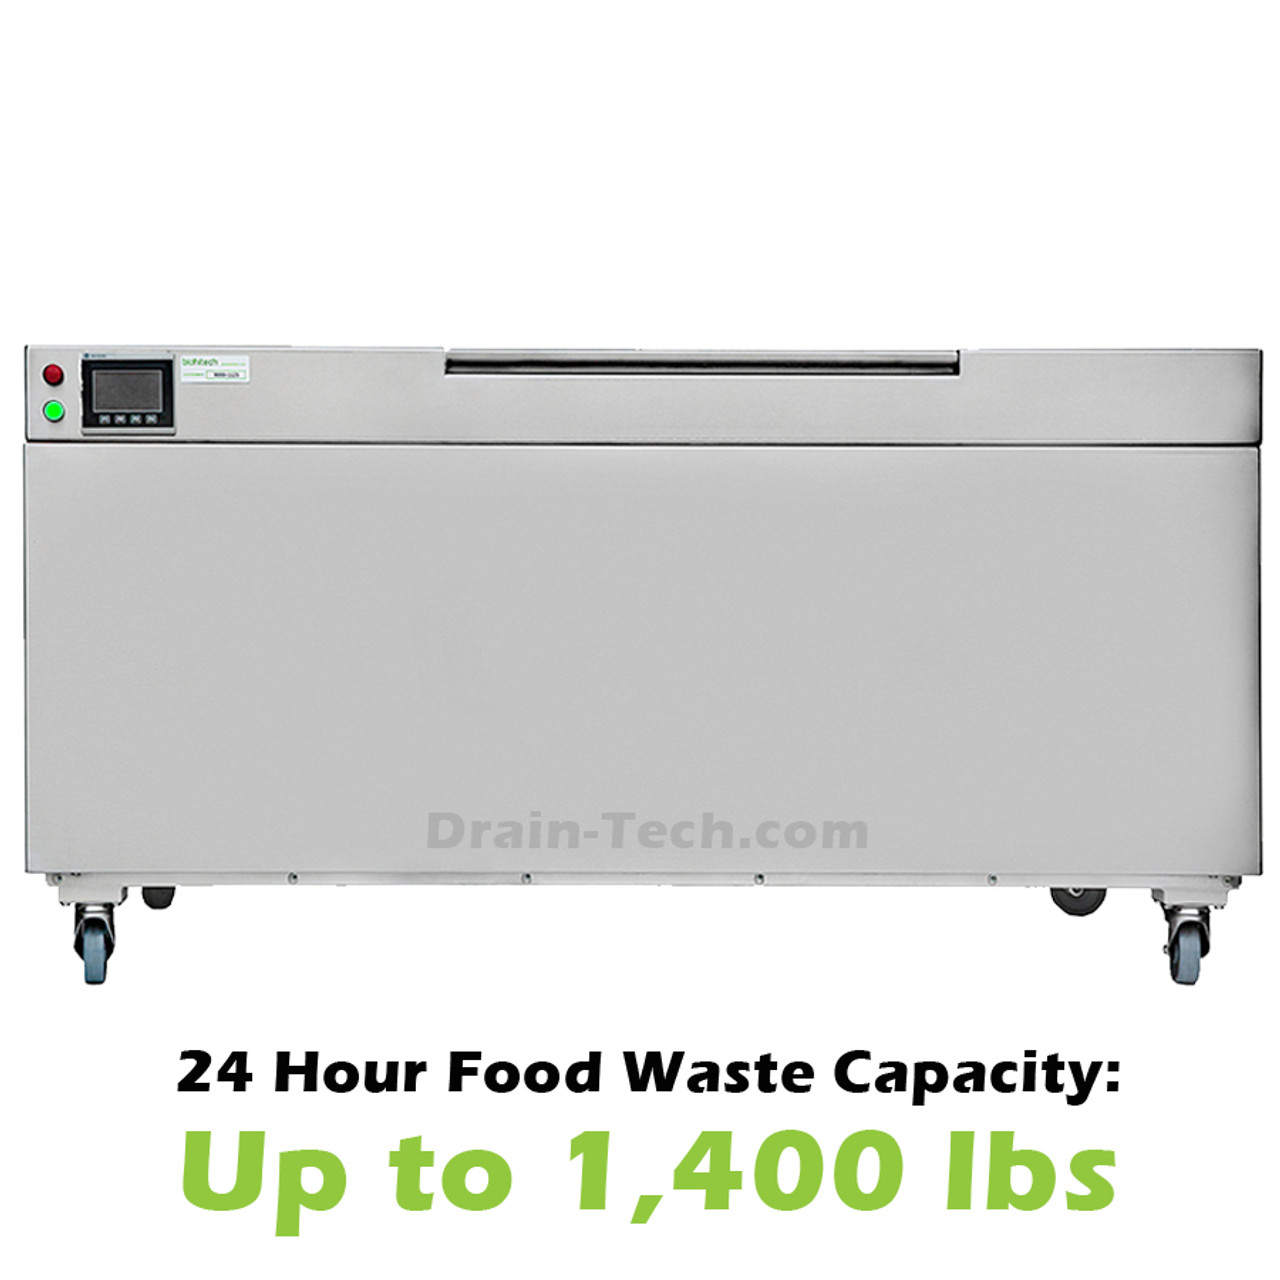 Mangrove Bio-Digester for food waste disposal